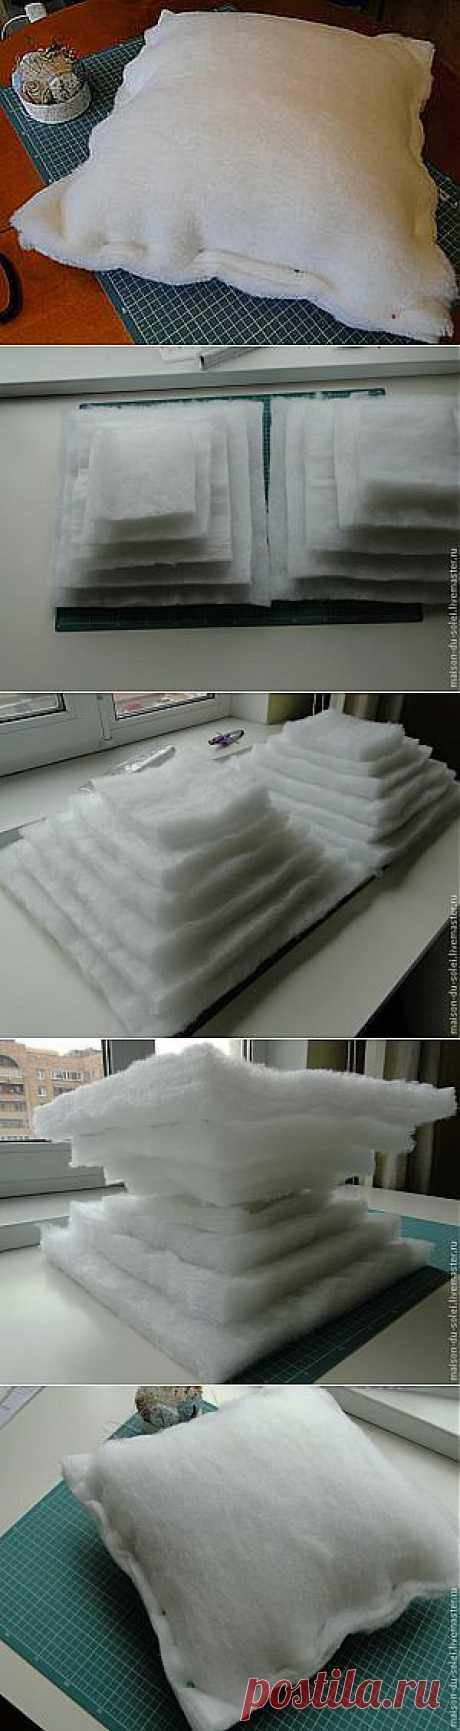 Шьем подушку